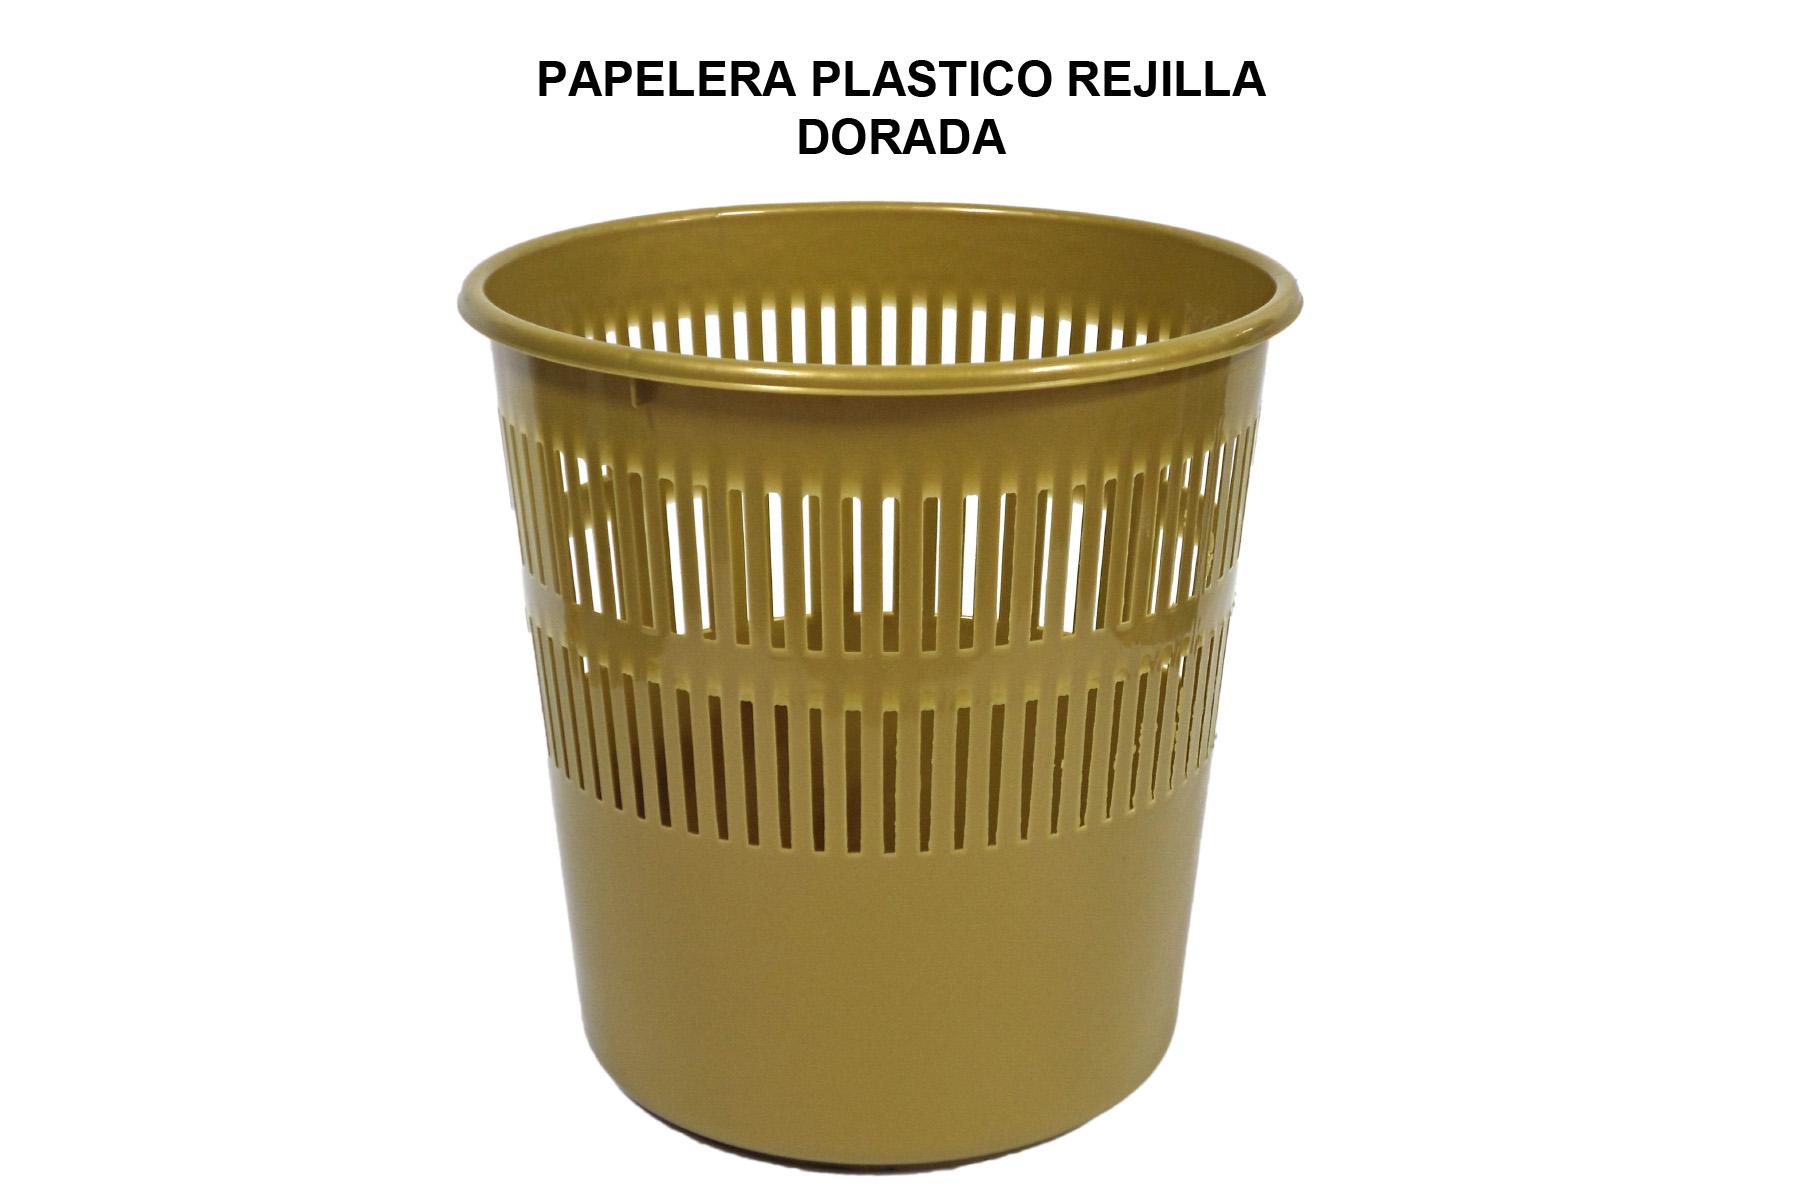 PAPELERA PLASTICO REJILLA DORADA